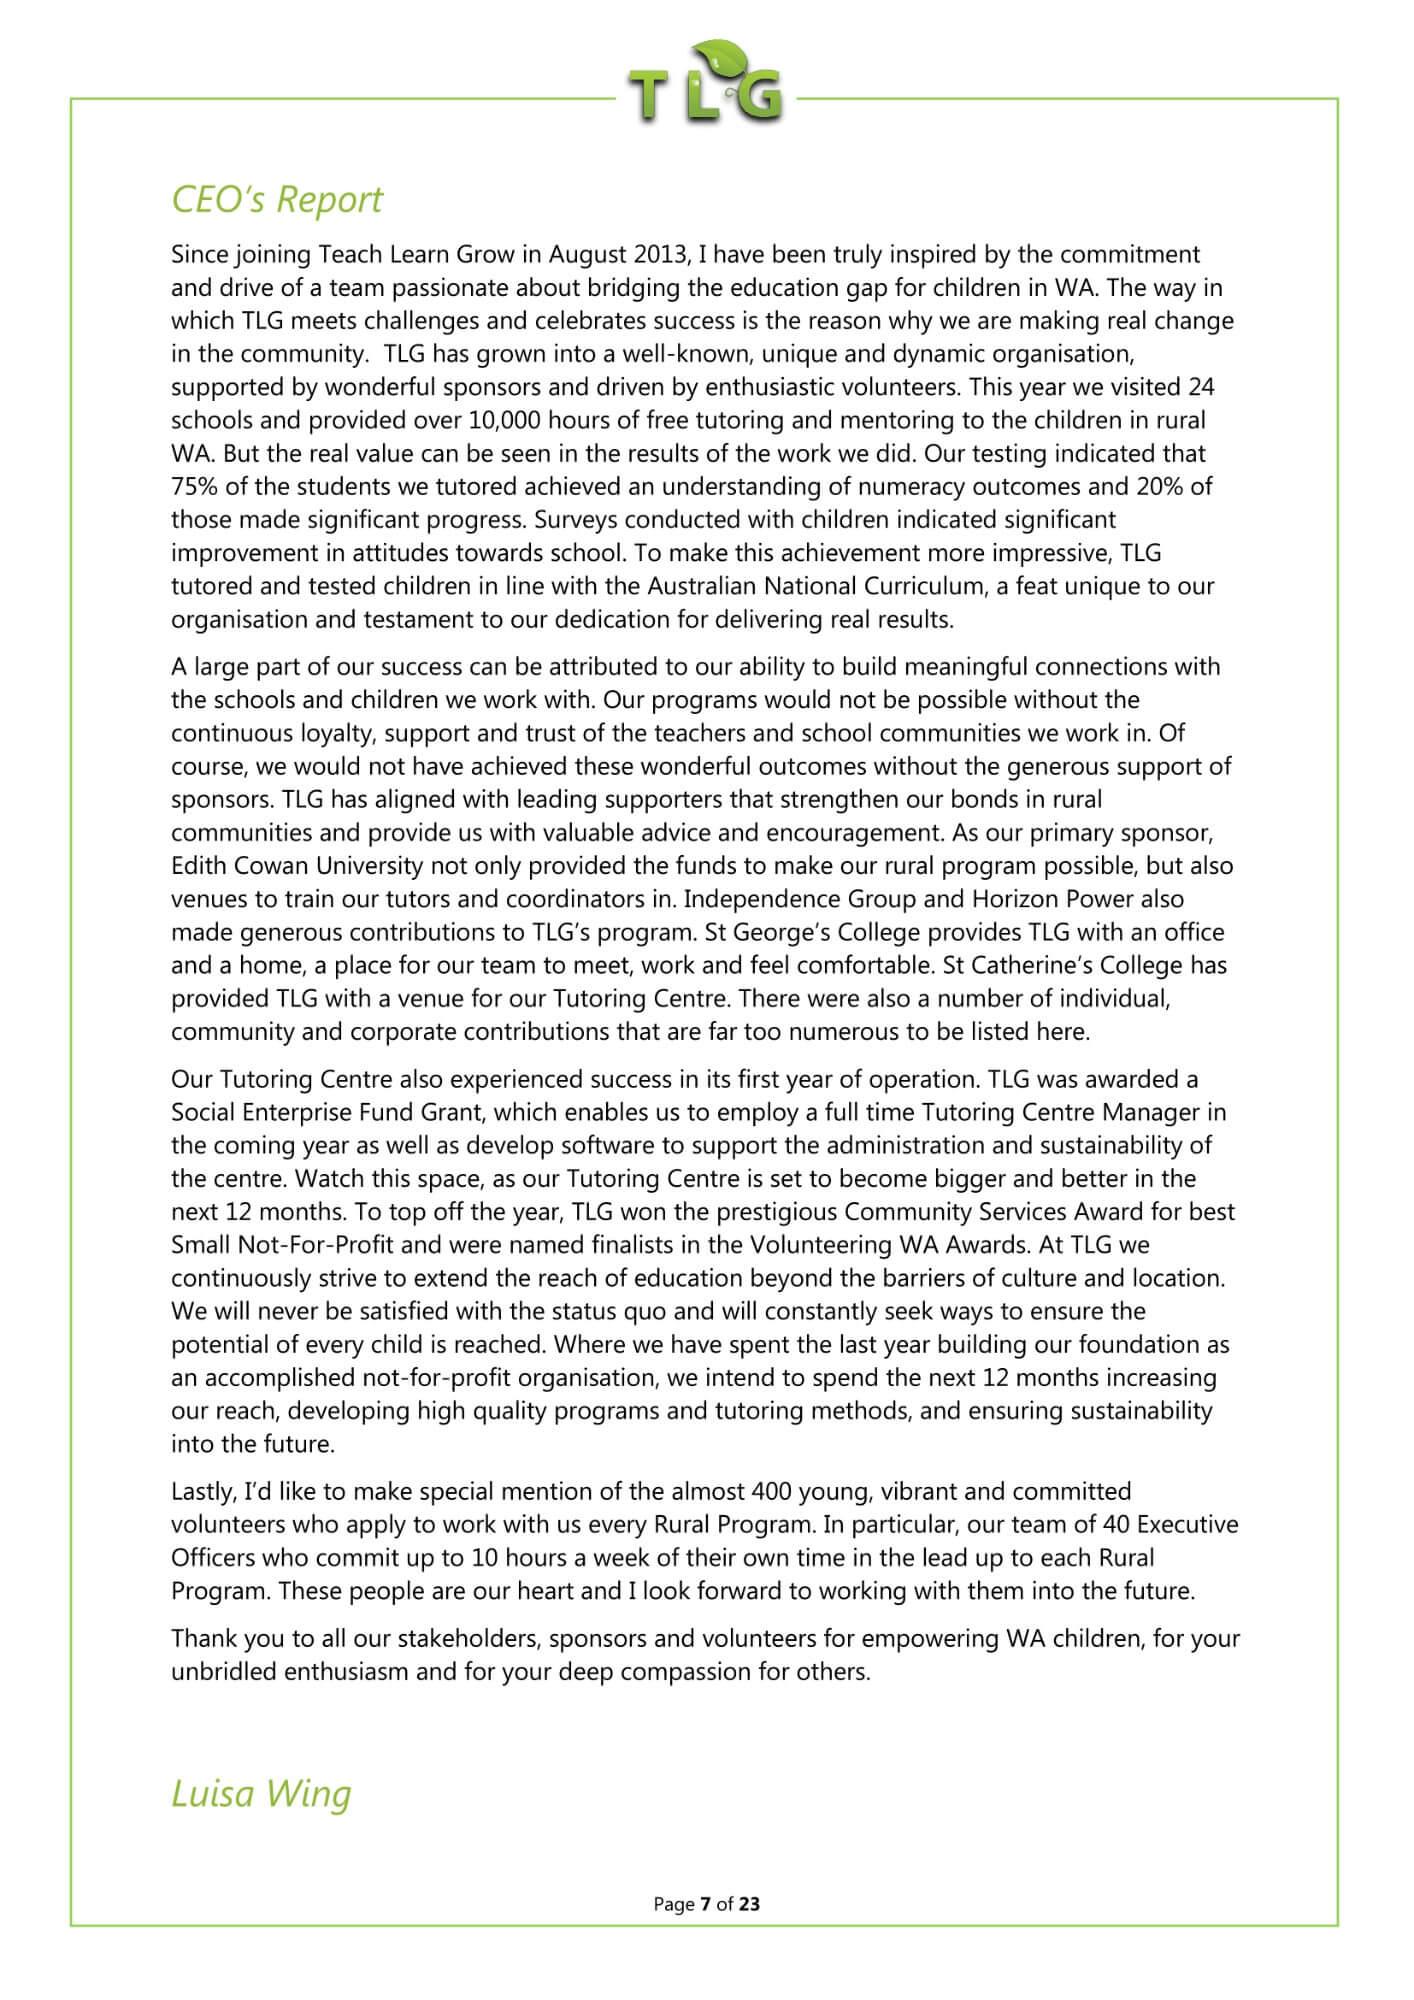 tlg-annual-report-FY13-07.jpg